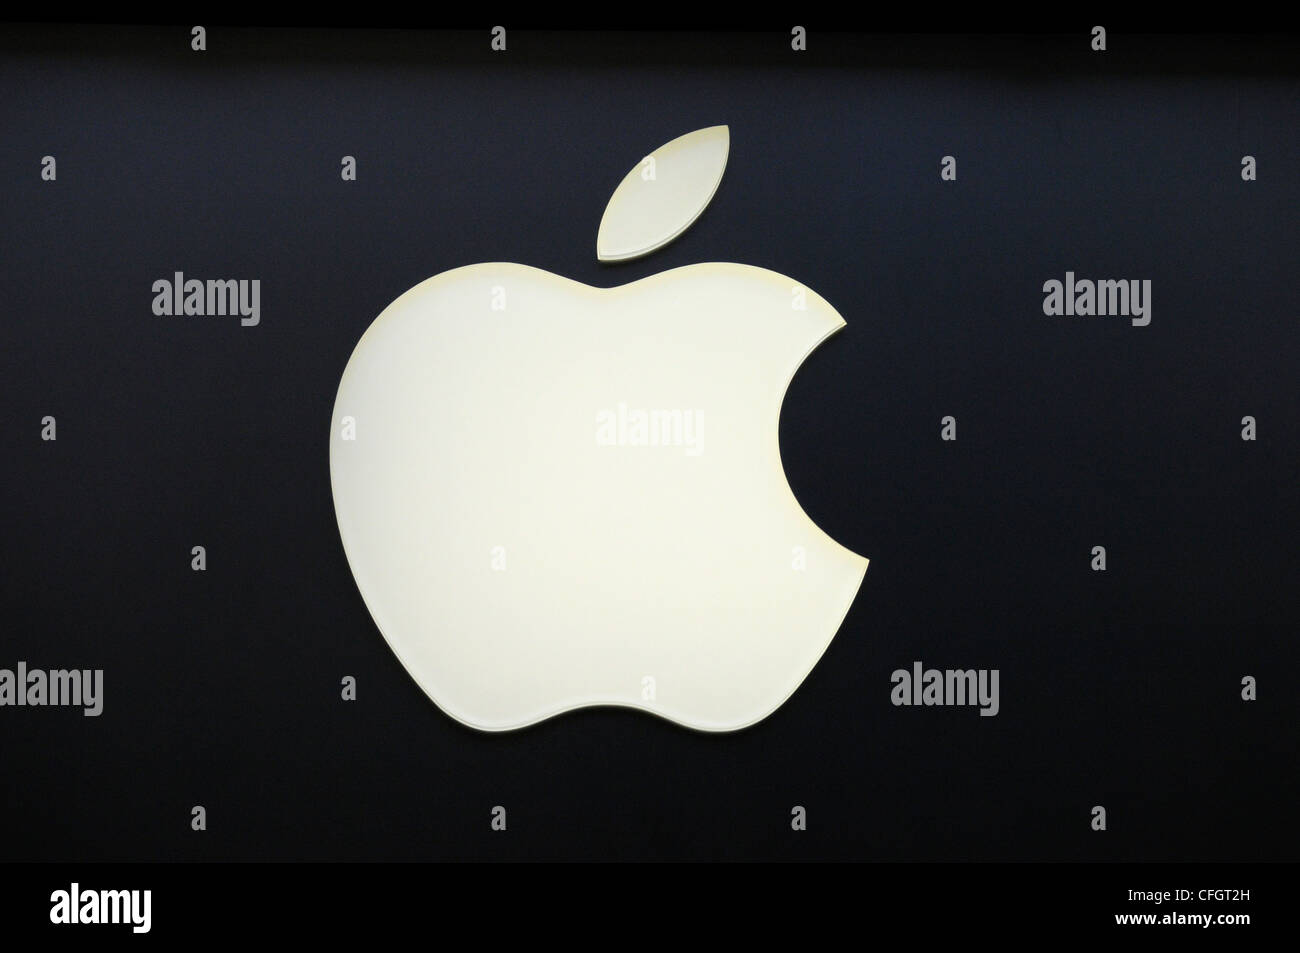 apple logo sign stock photos & apple logo sign stock images - alamy